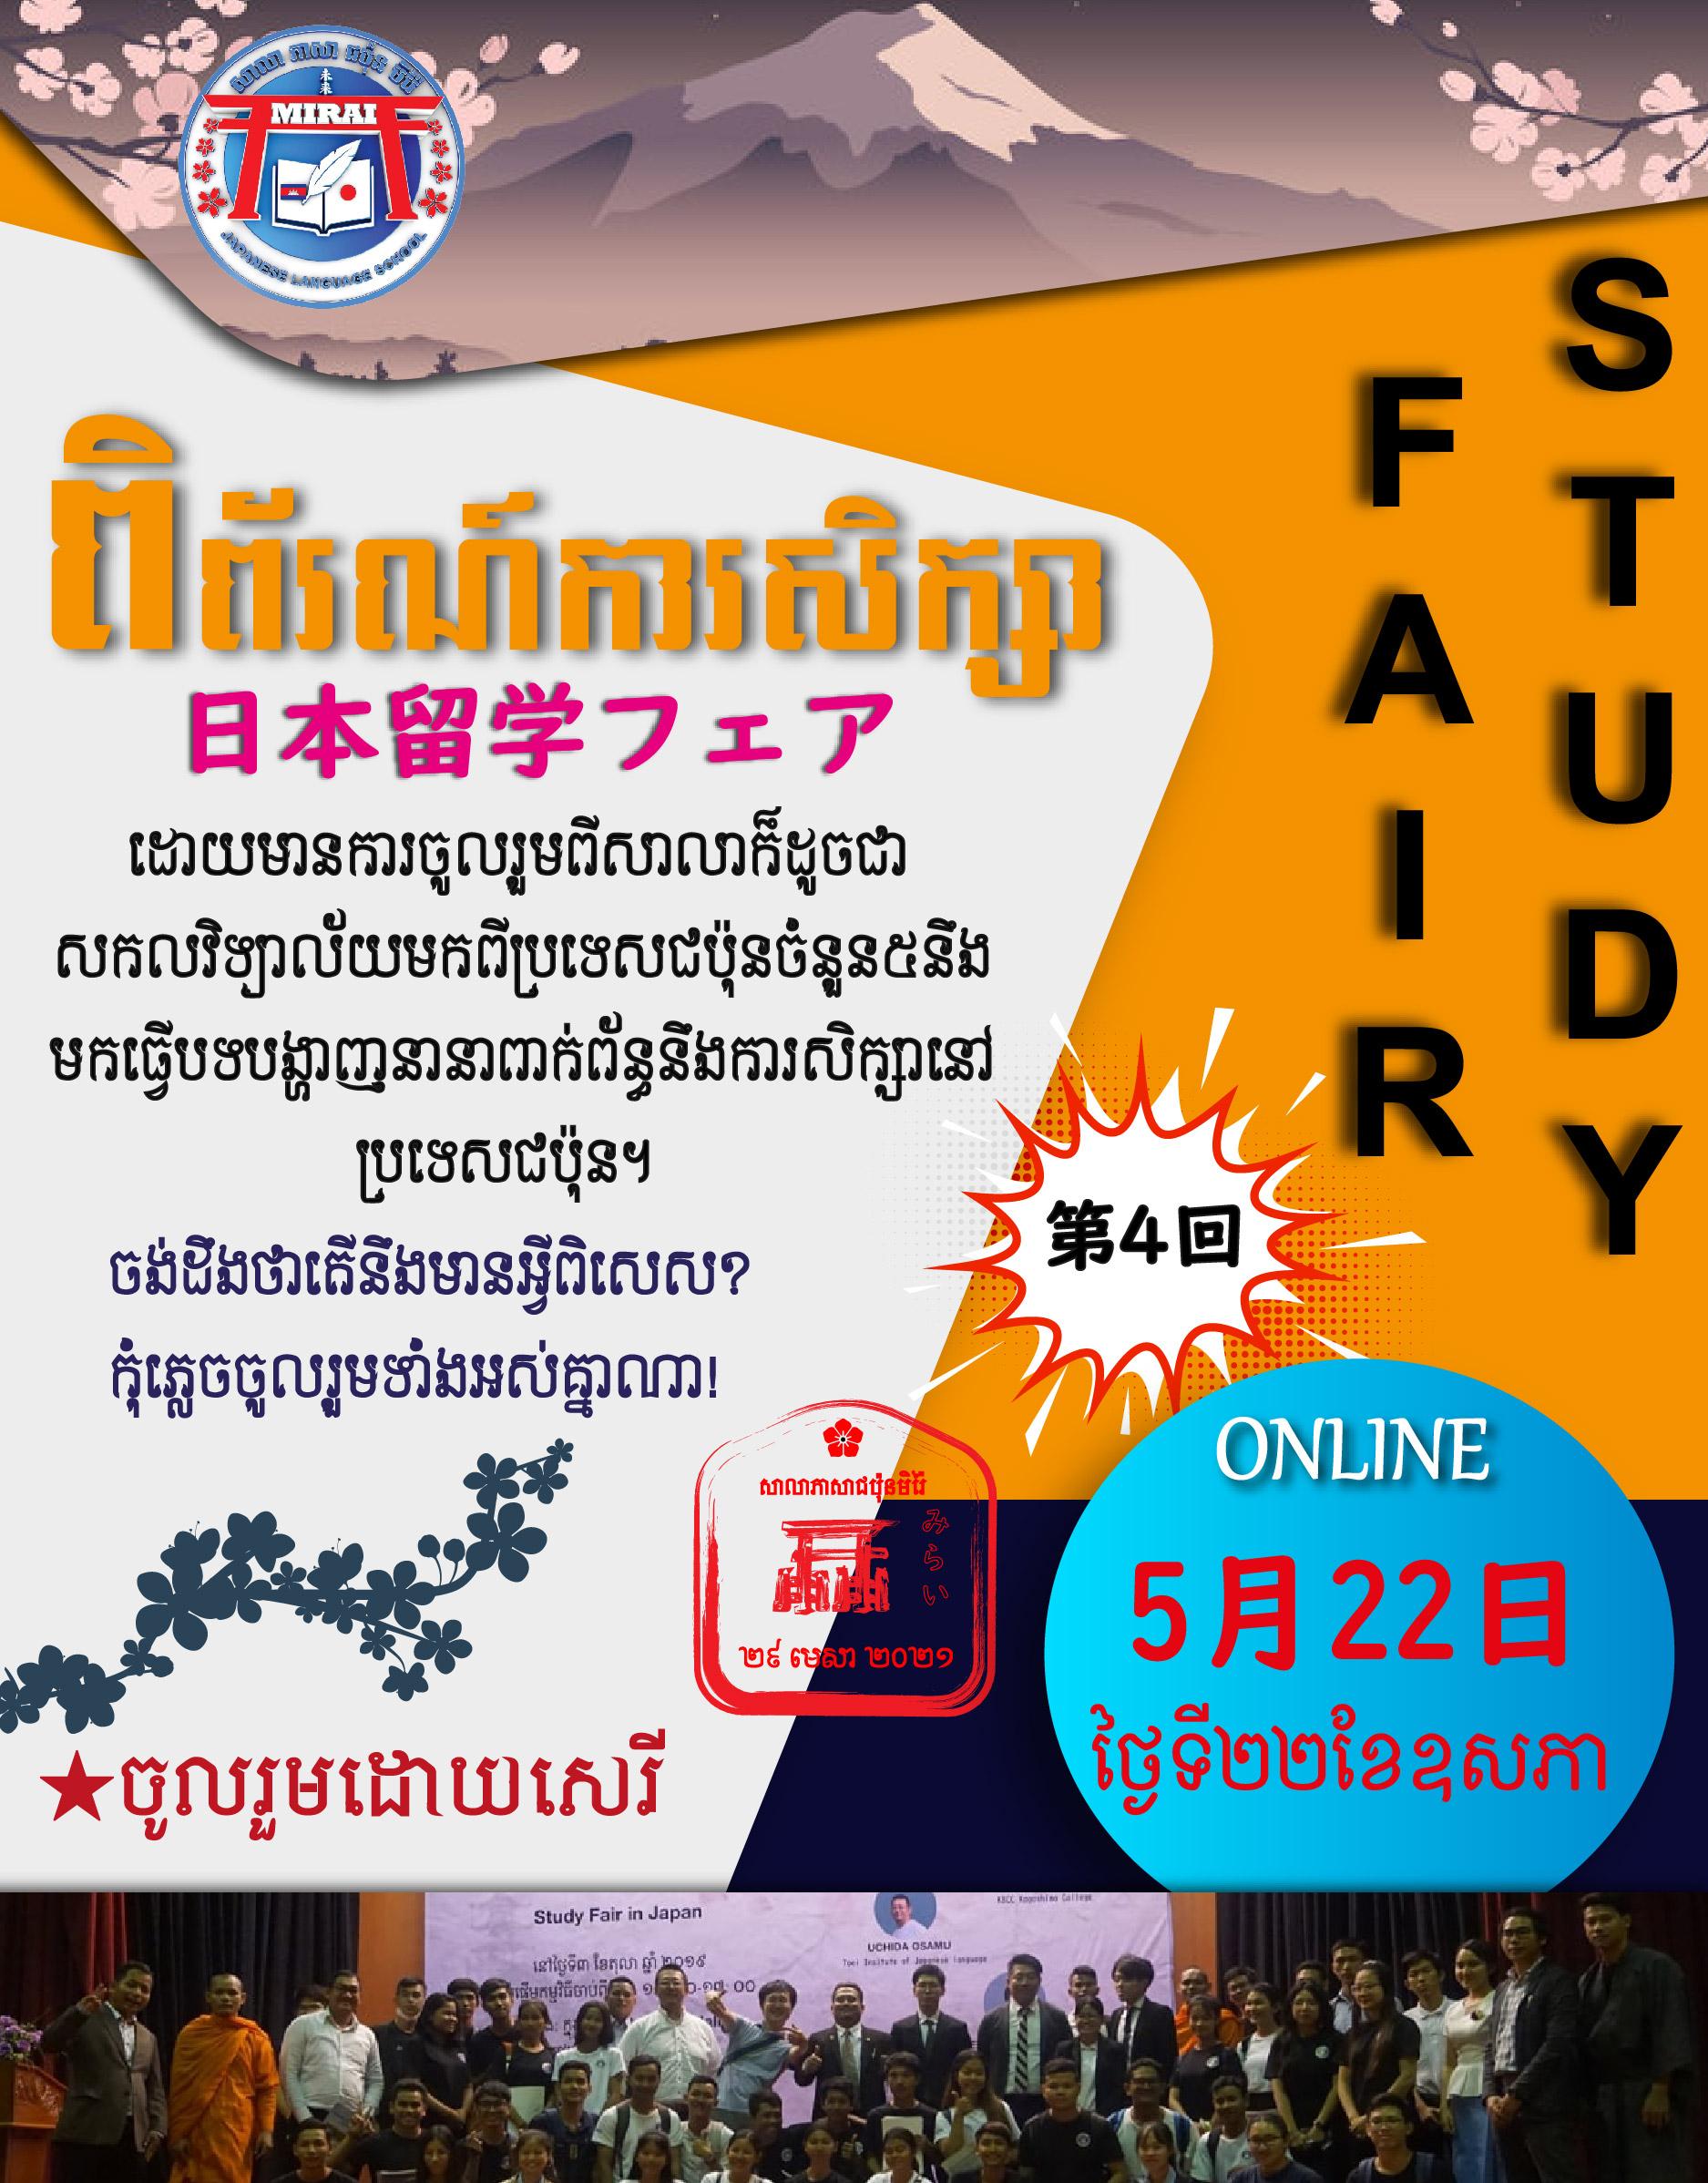 Online Study Fair